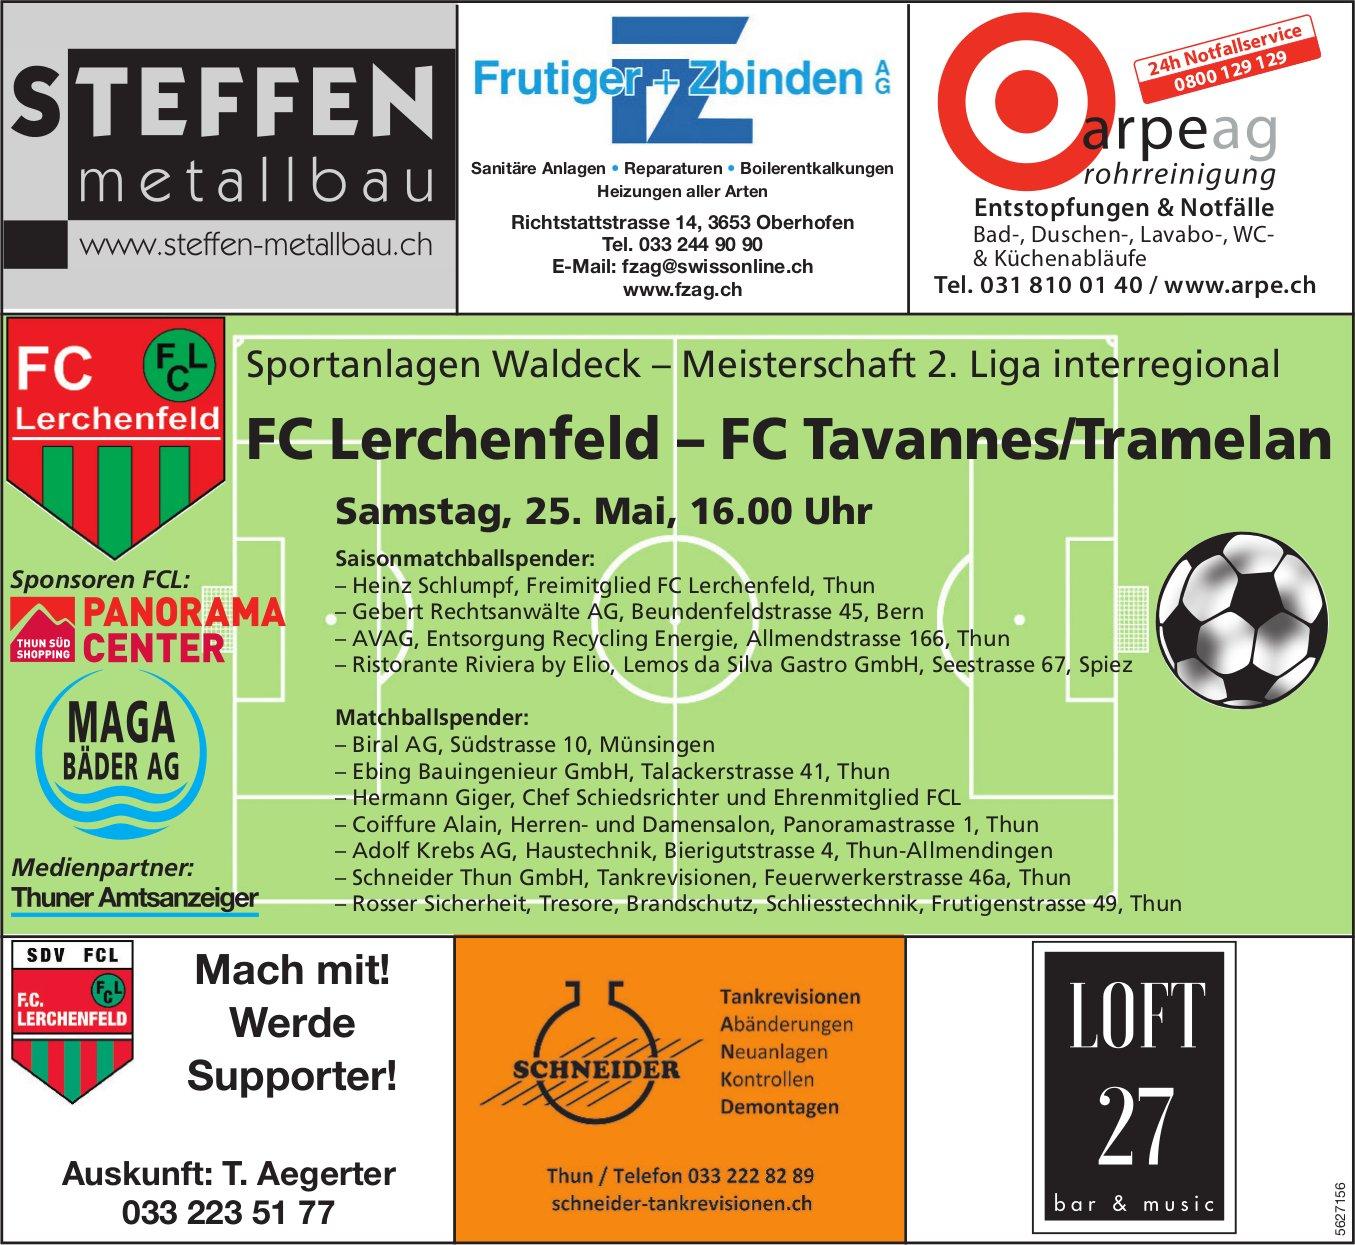 Meisterschaft 2. Liga interregional - FC Lerchenfeld vs. FC Tavannes/Tramelan am 25. Mai